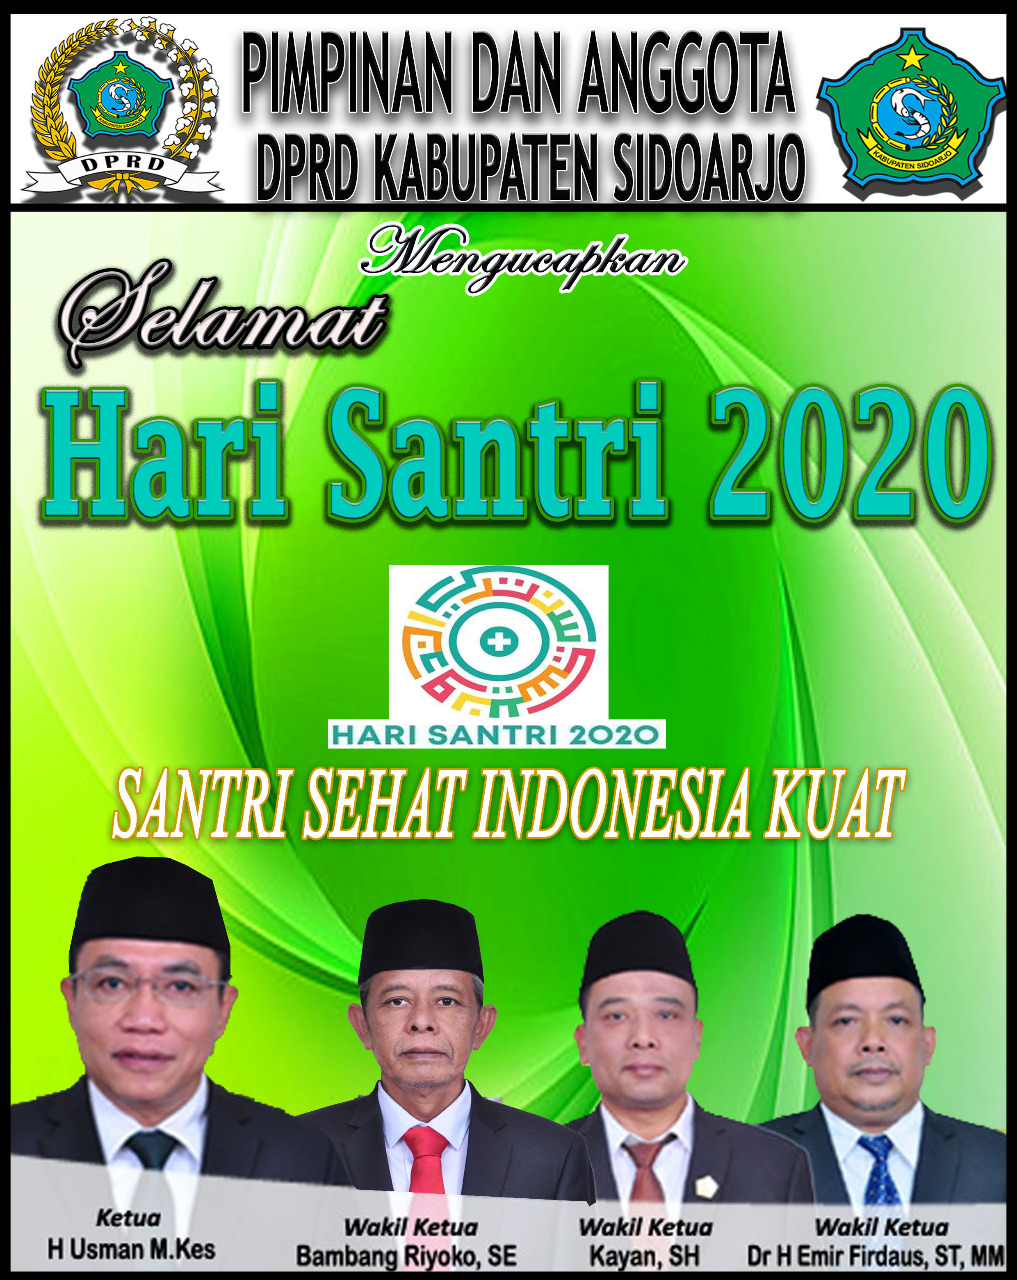 Pimpinan dan Anggota DPRD Sidoarjo Mengucapkan Selamat Hari Santri 2020